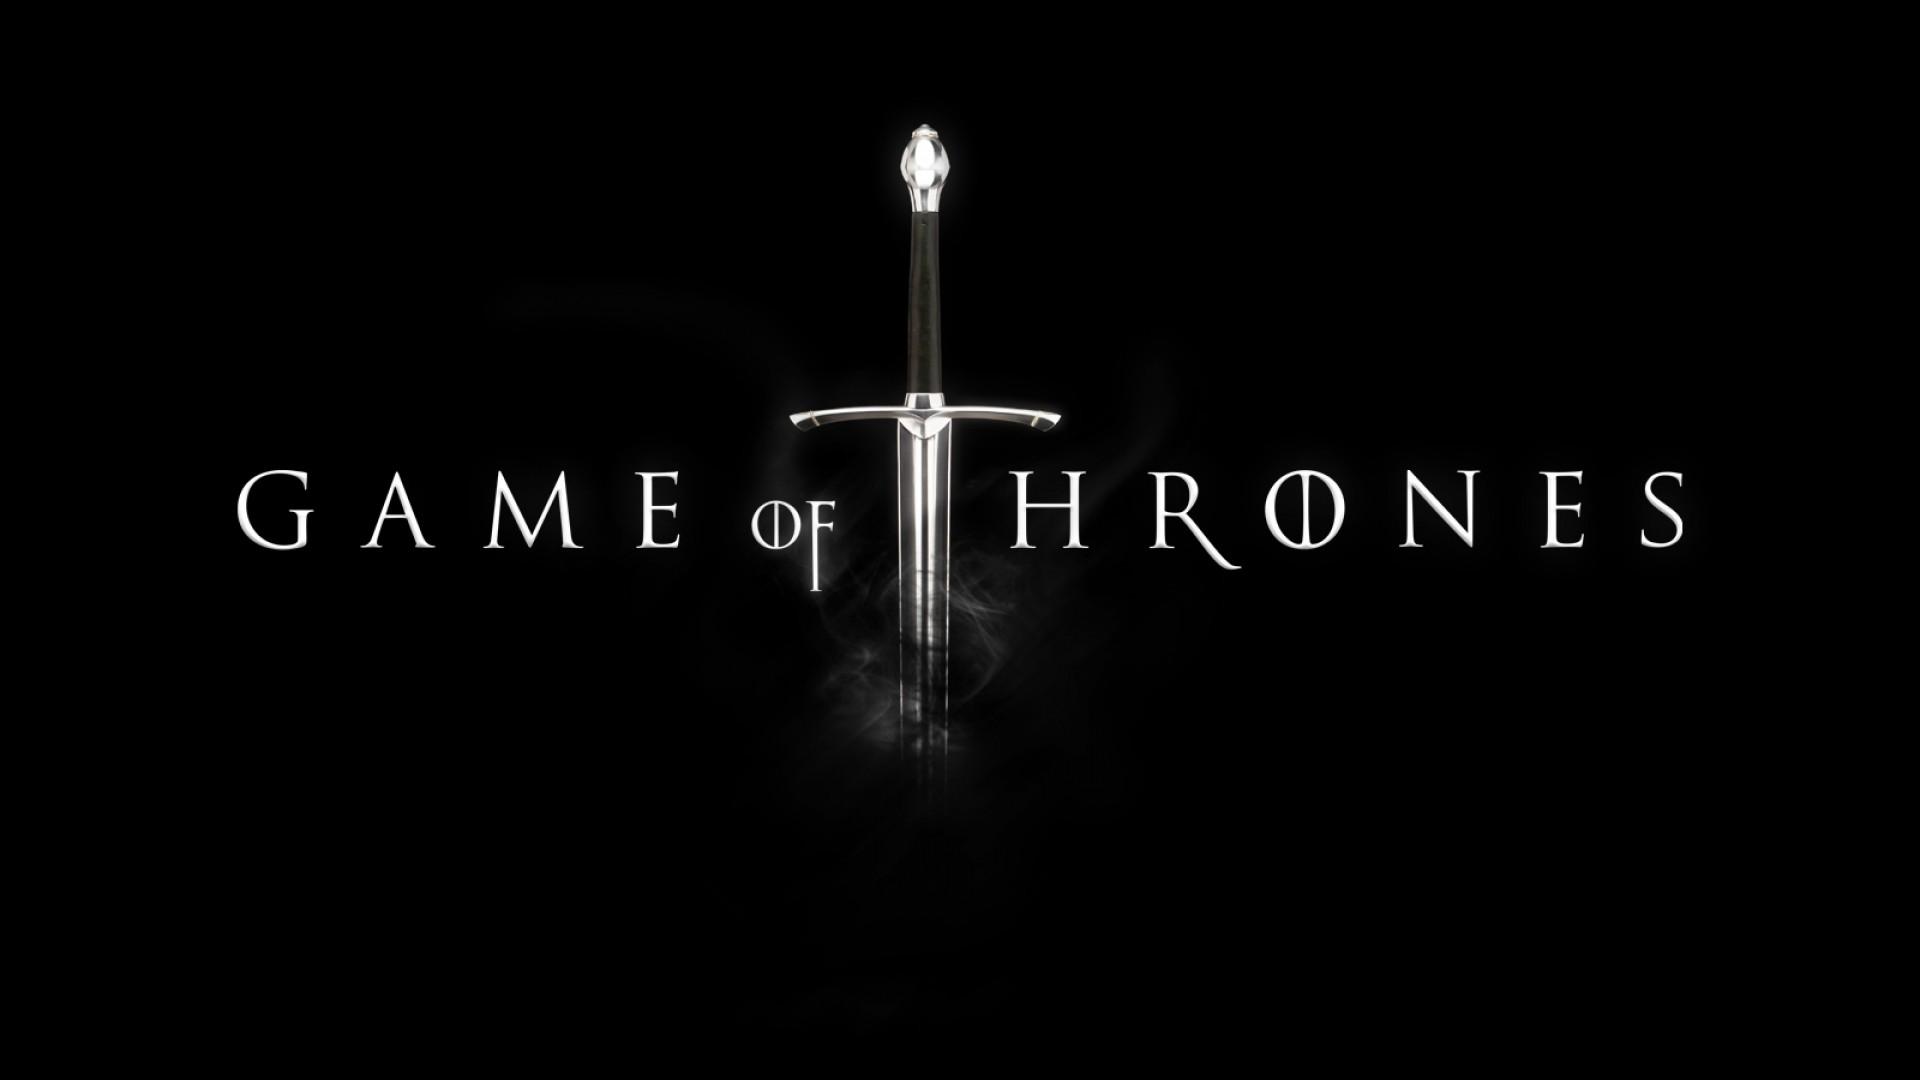 Game Of Thrones Wallpaper 1920X1080 wallpaper   1243800 1920x1080